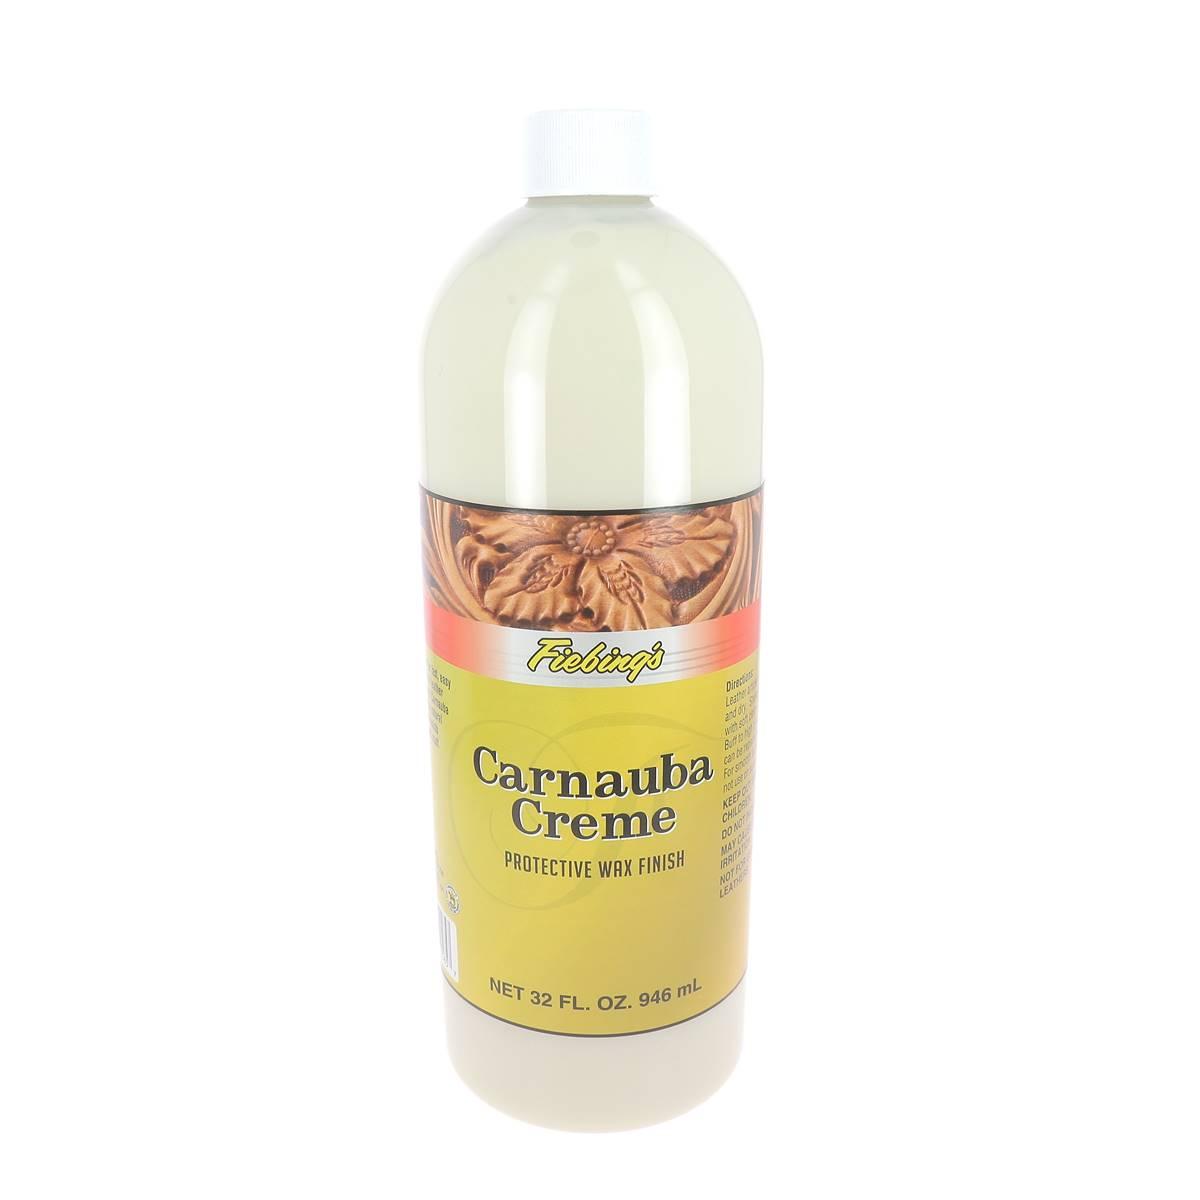 Crème à la cire de Carnauba - FIEBING'S CARNAUBA CREME - Bidon de 946 ml